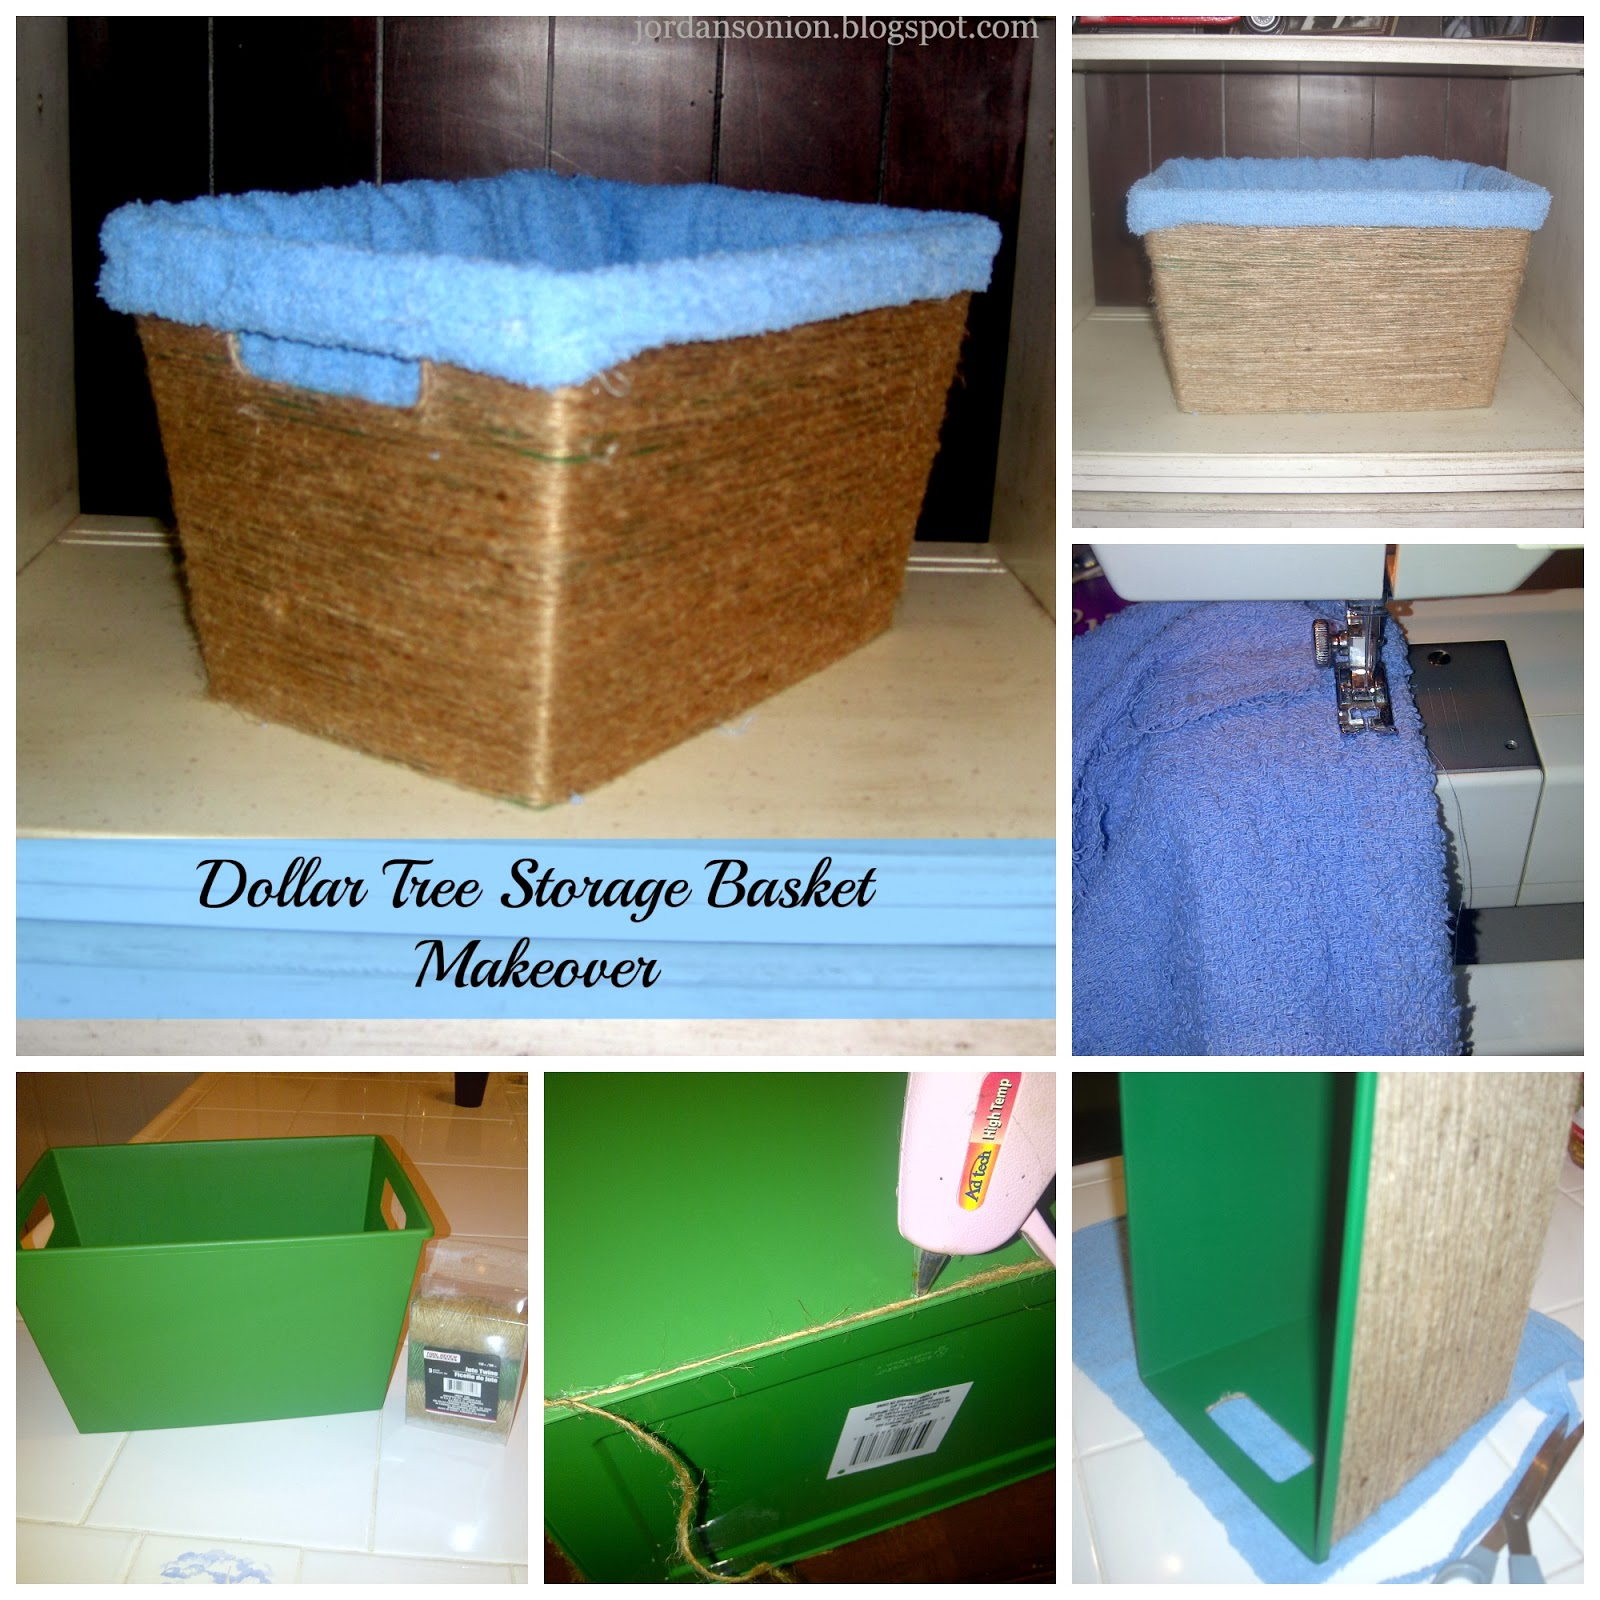 Dollar Tree Storage Basket Makeover